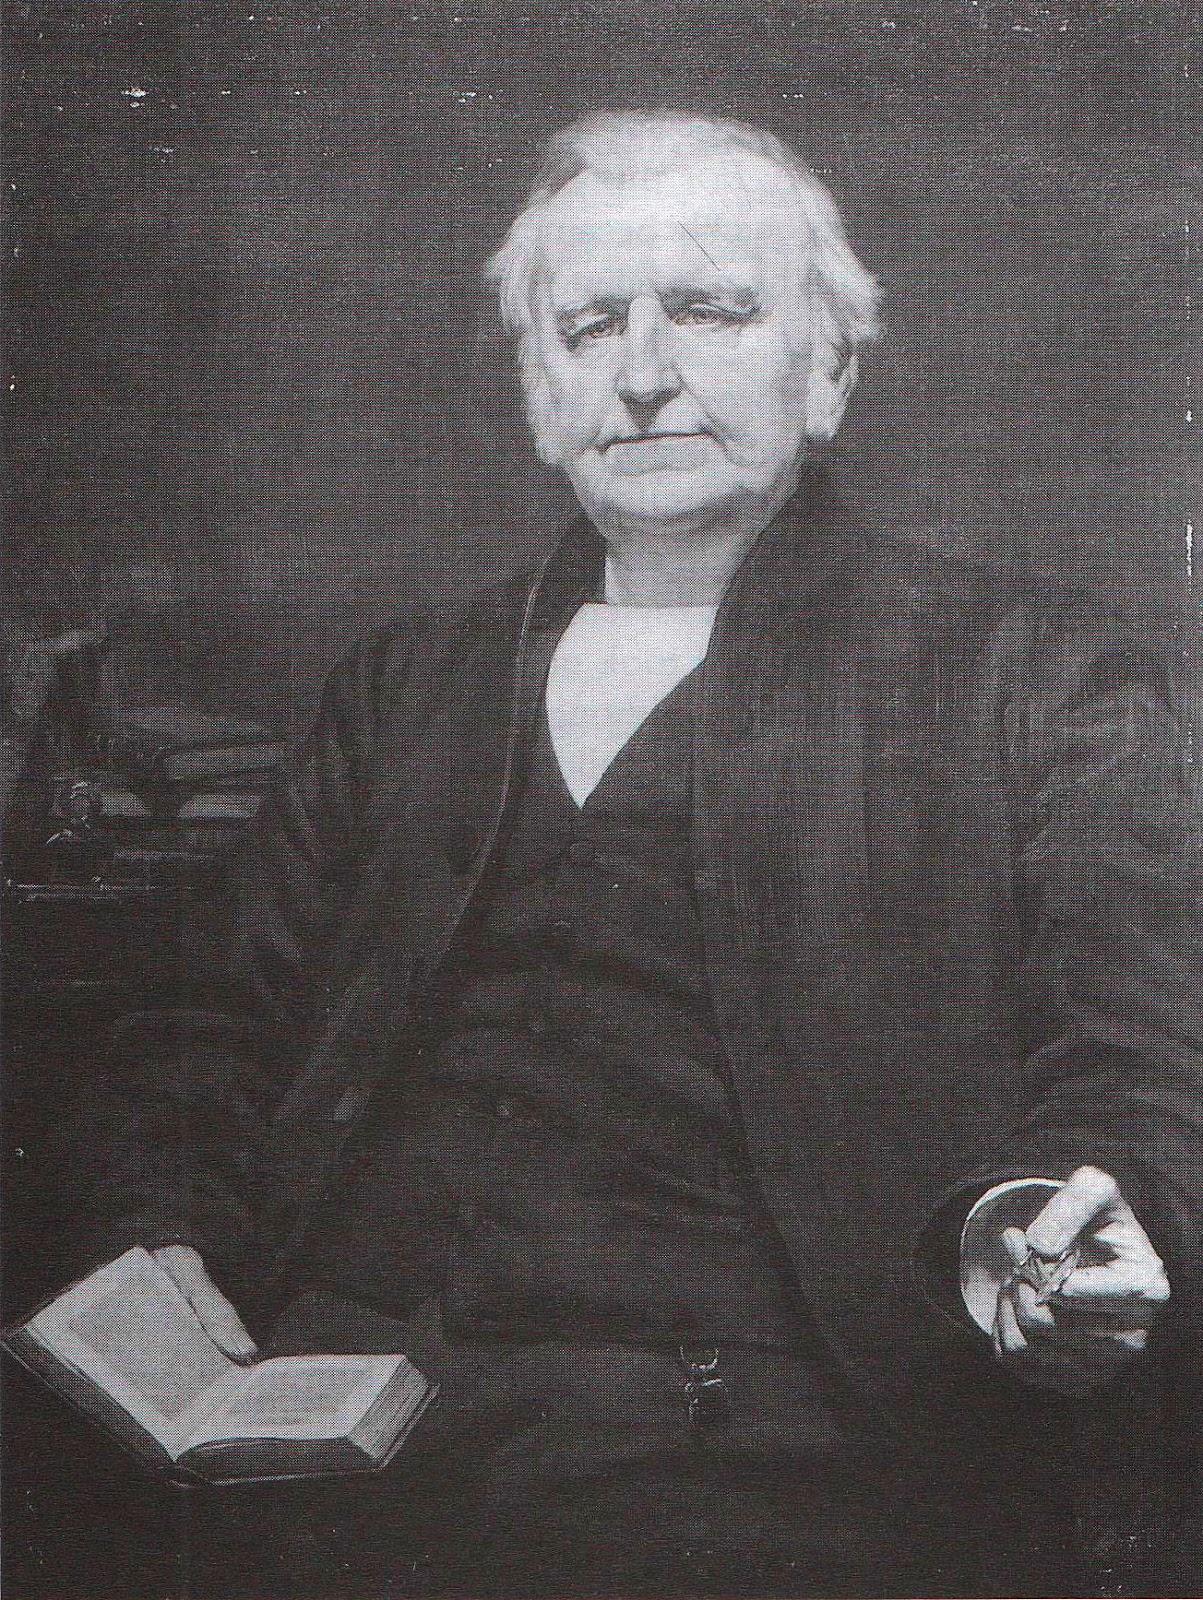 Quaker Alphabet Blog Week 33 - Q for The Quaker Bishop, Joseph Bevan  Braithwaite